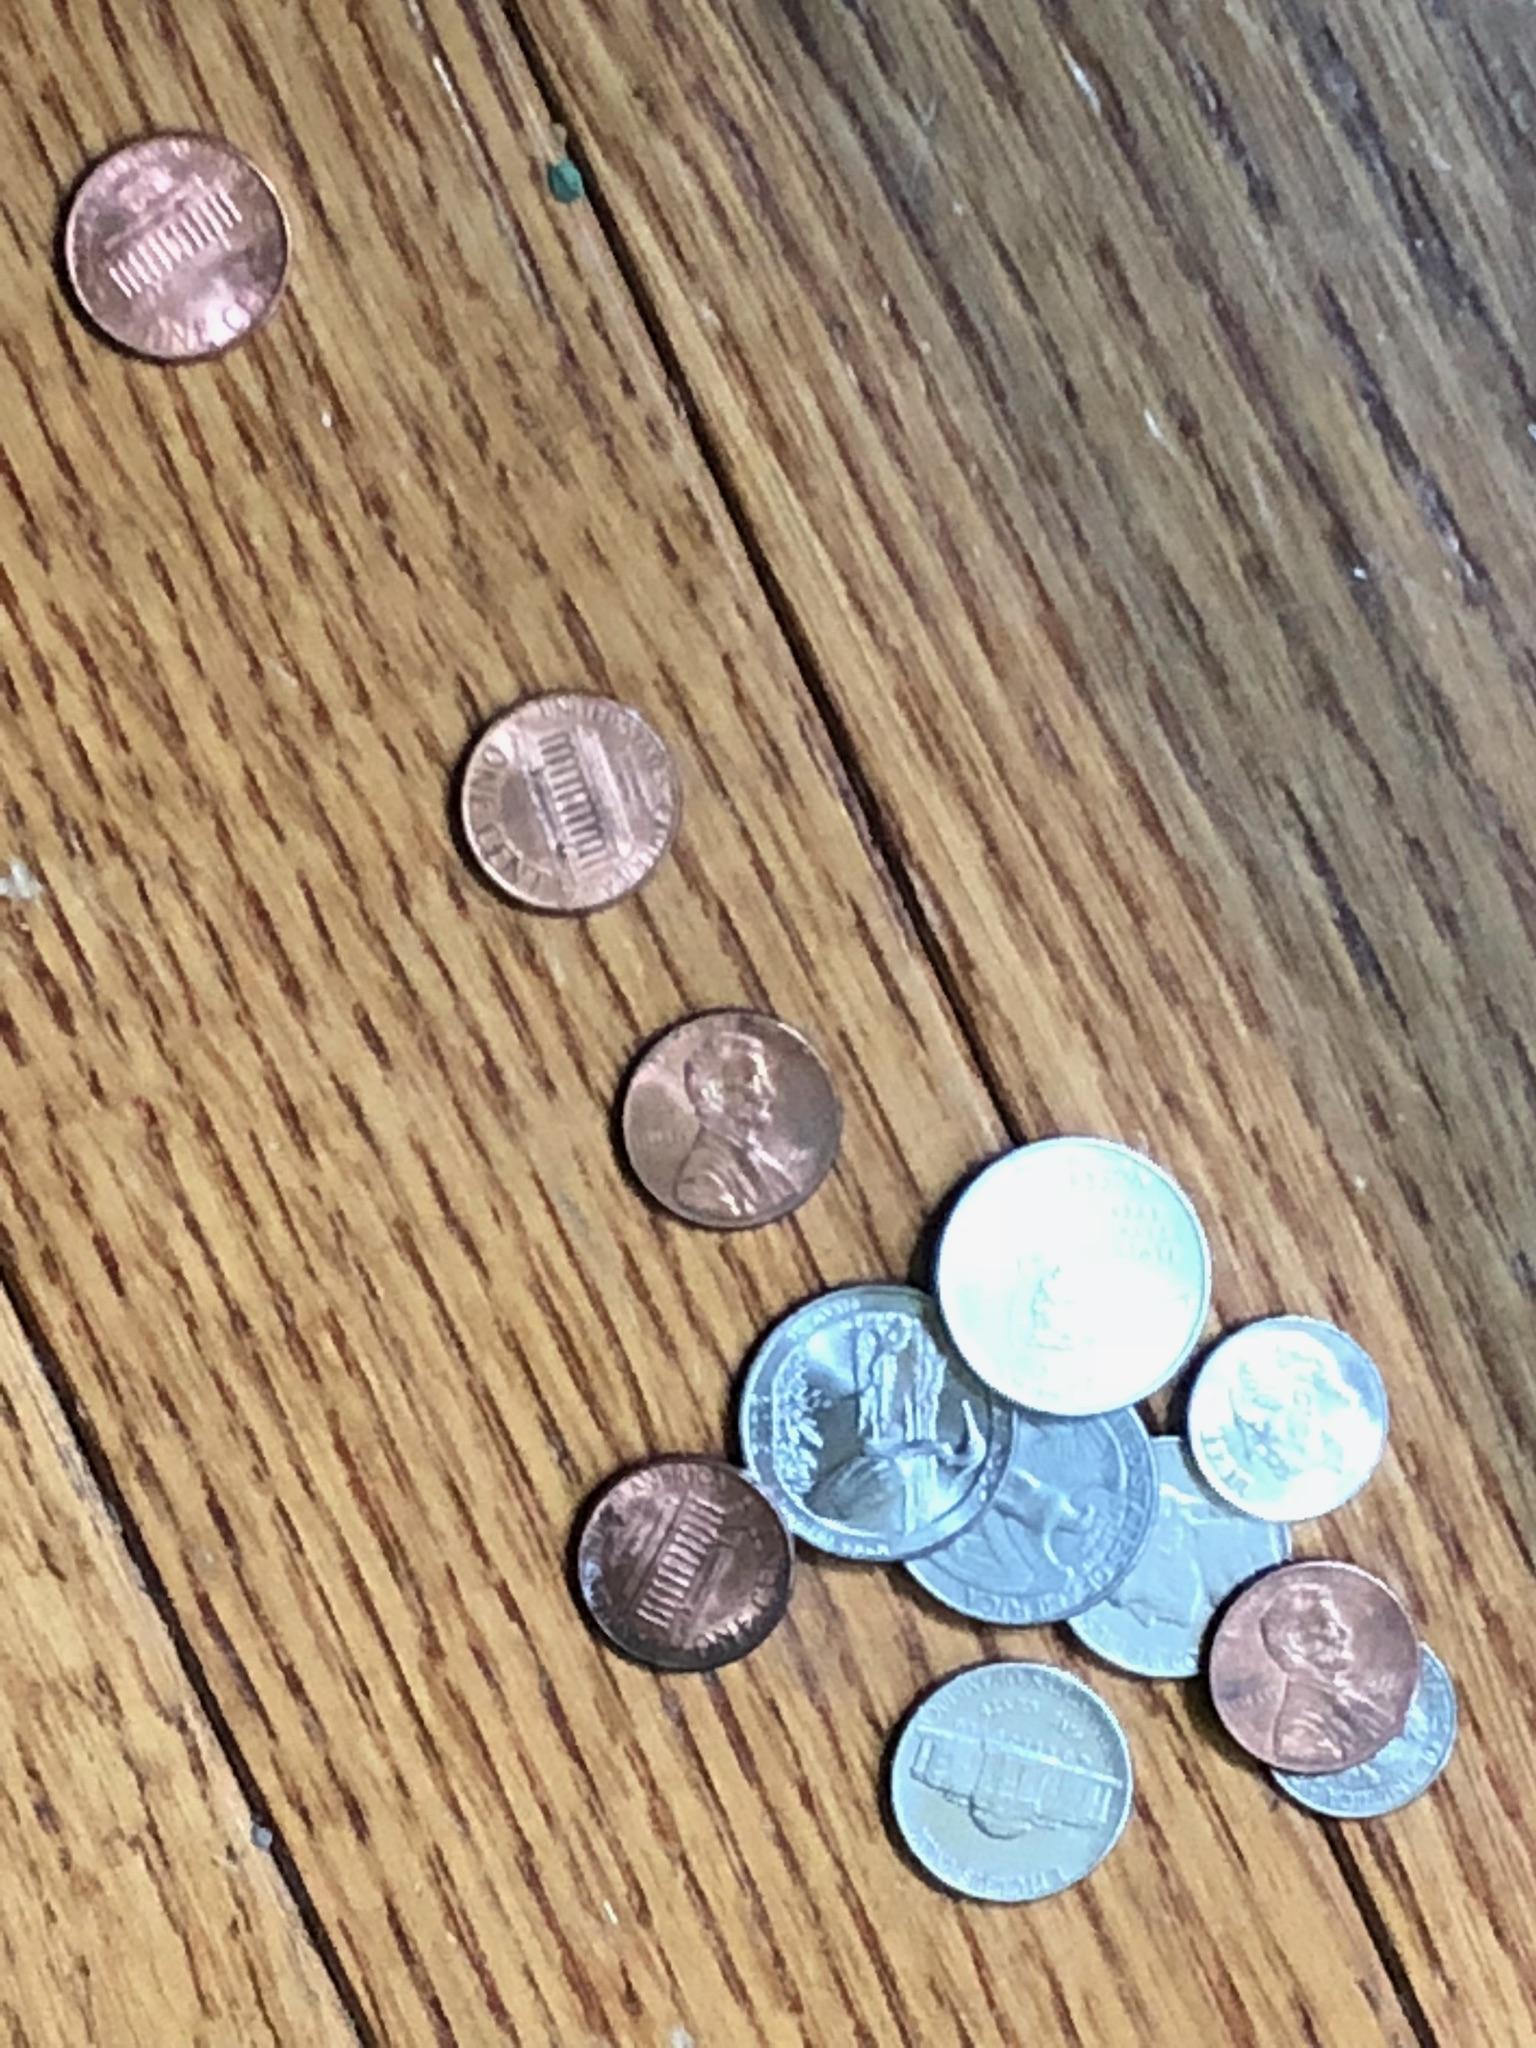 IMG_0427.jpg naps coins 4 july 2018